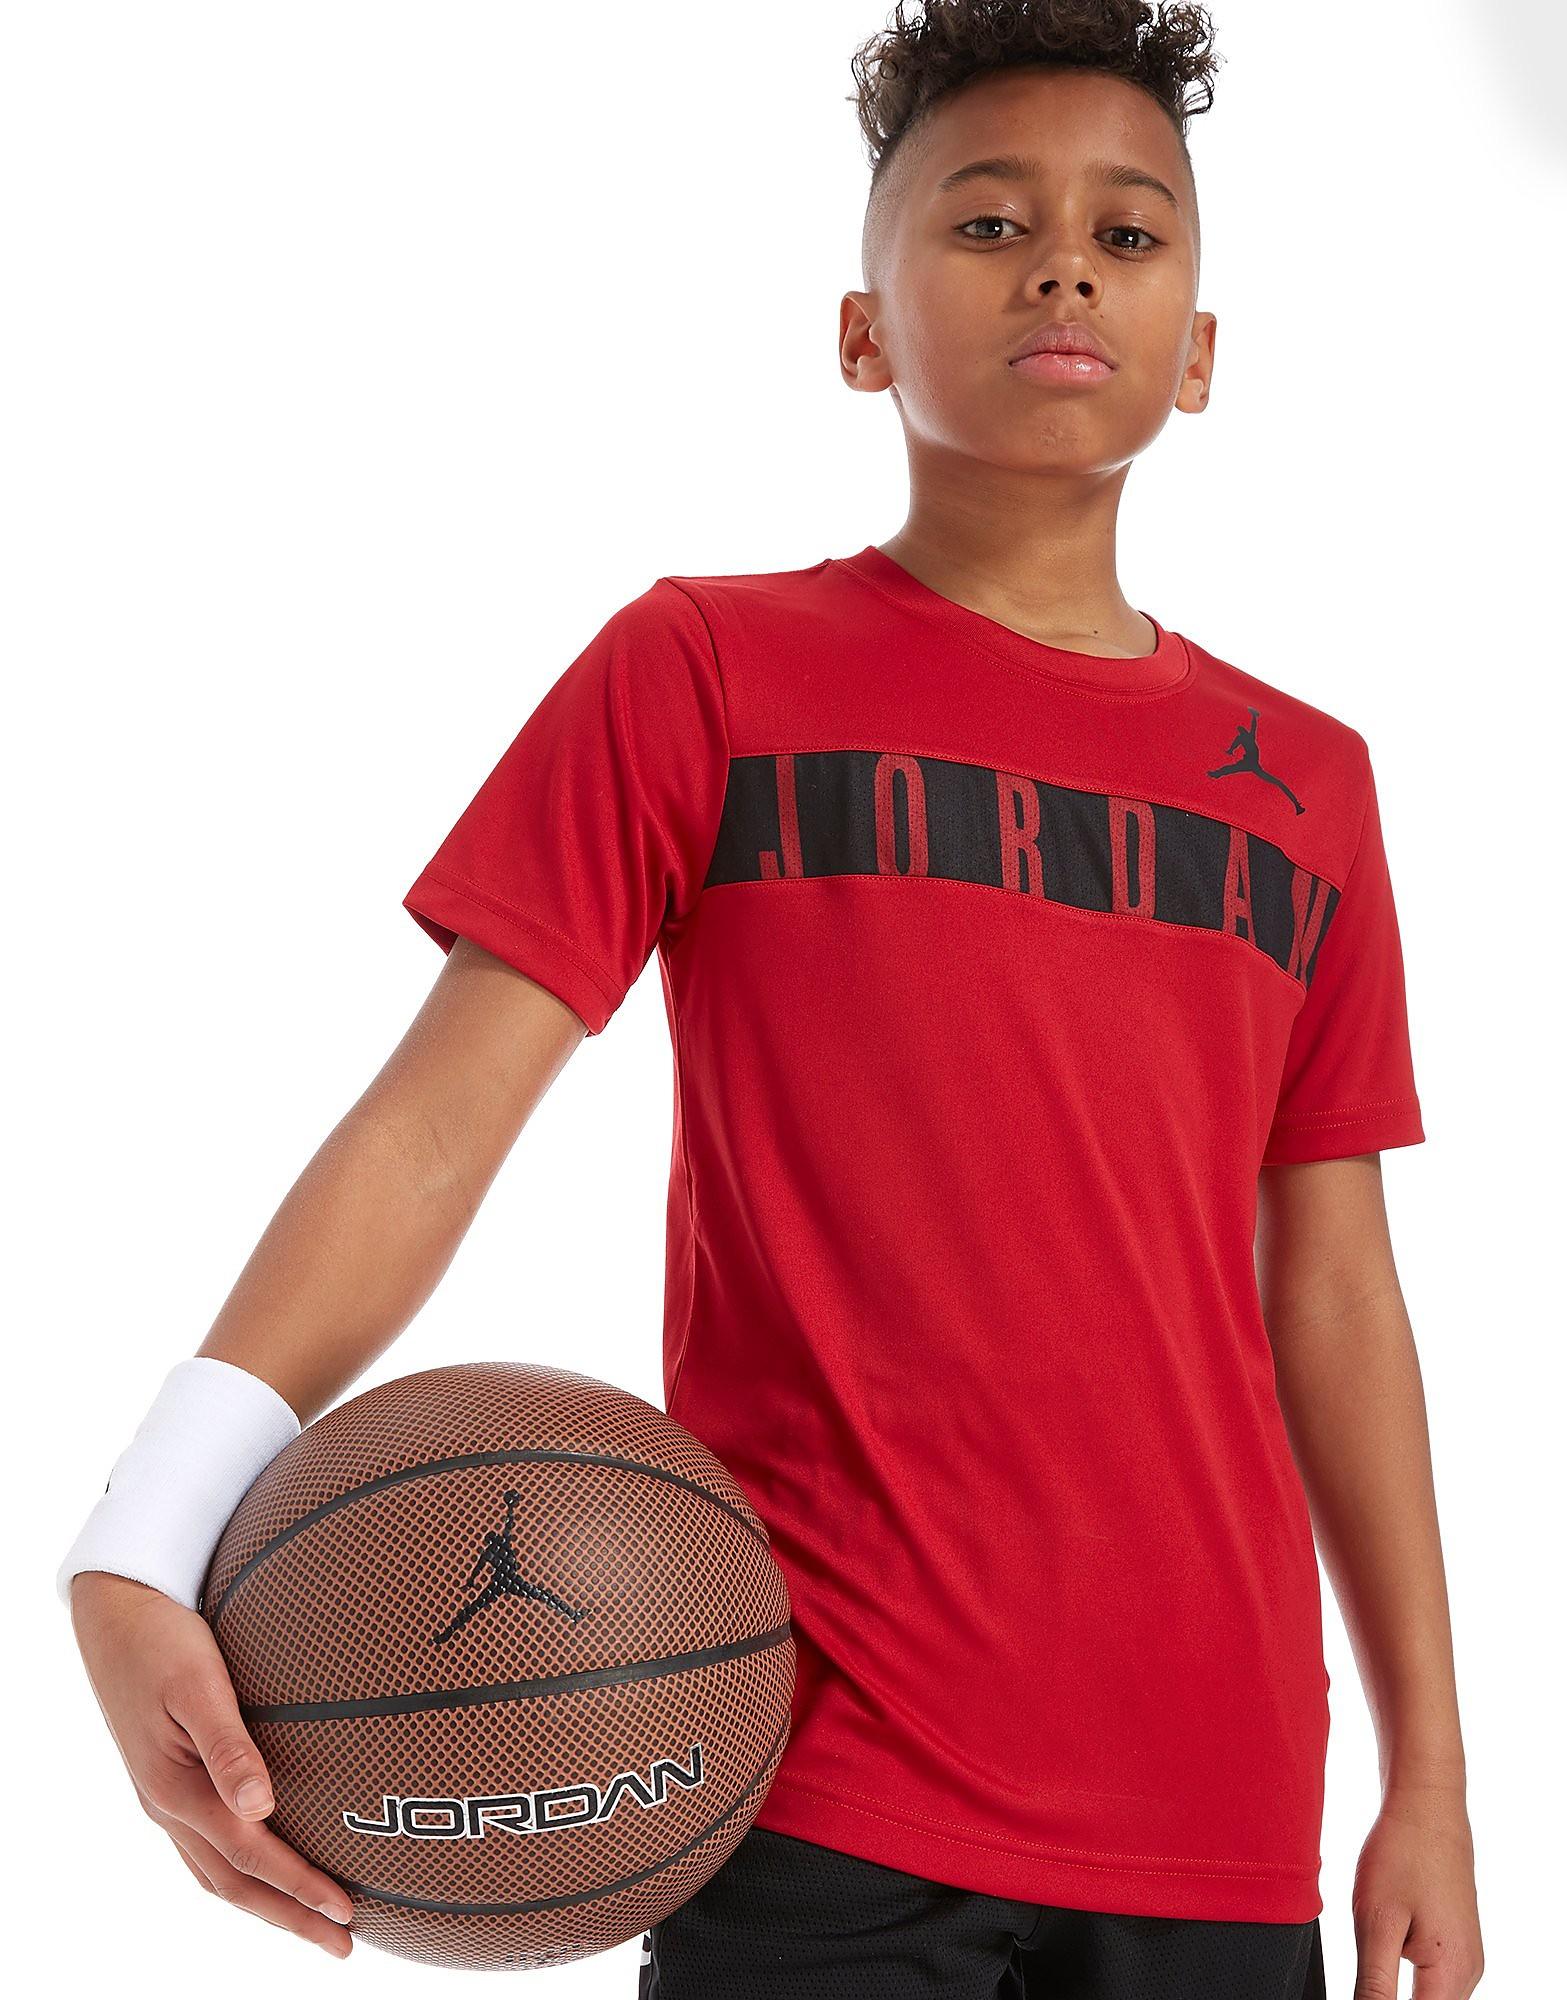 Jordan camiseta MJ júnior